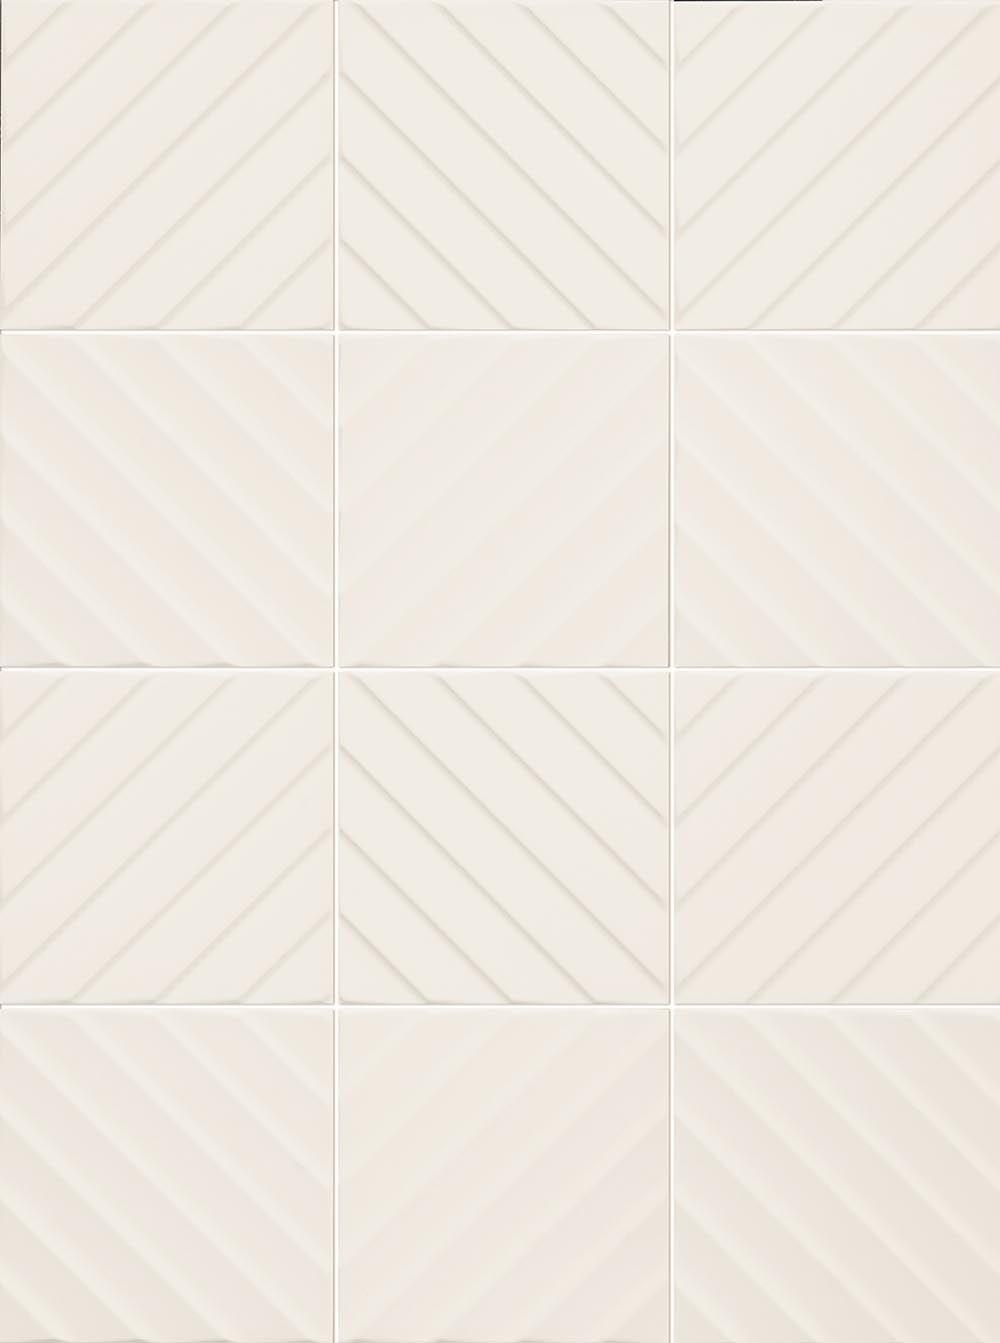 Multidimensional 3d Textured Ceramic Wall Tiles Creative Materials White Kitchen Wall Tiles Deep Blue Decor White Wall Tiles